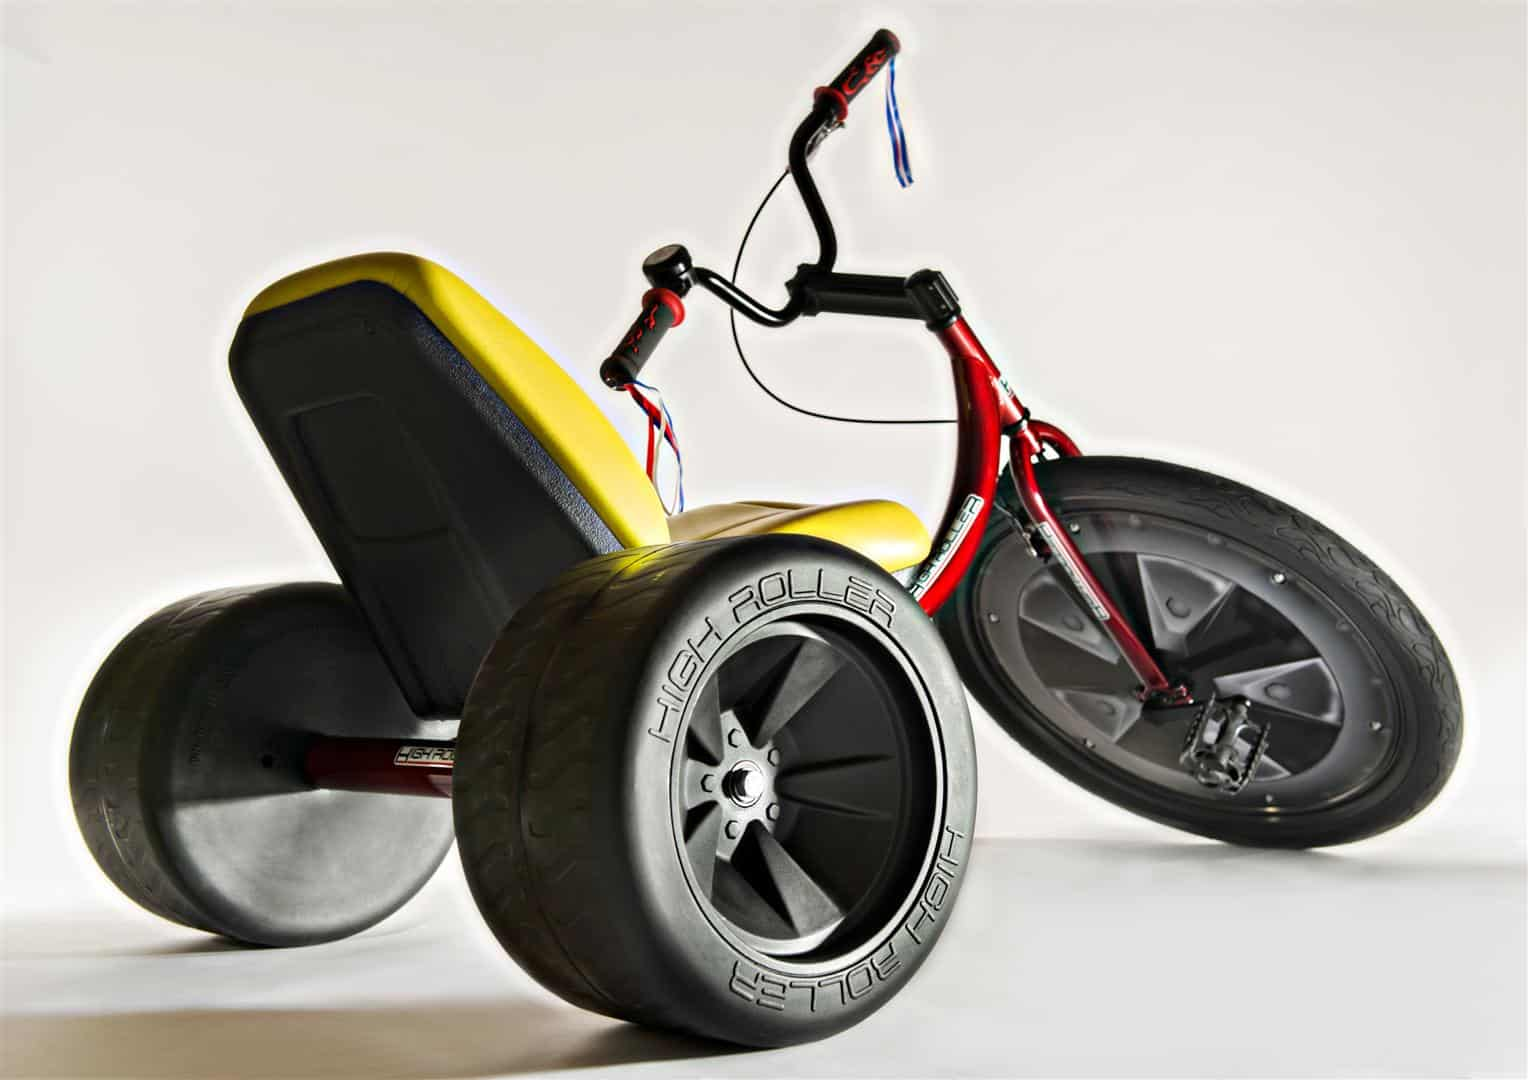 High Roller Adult Size Big Wheel Trike Fun Toy for the Big Boy